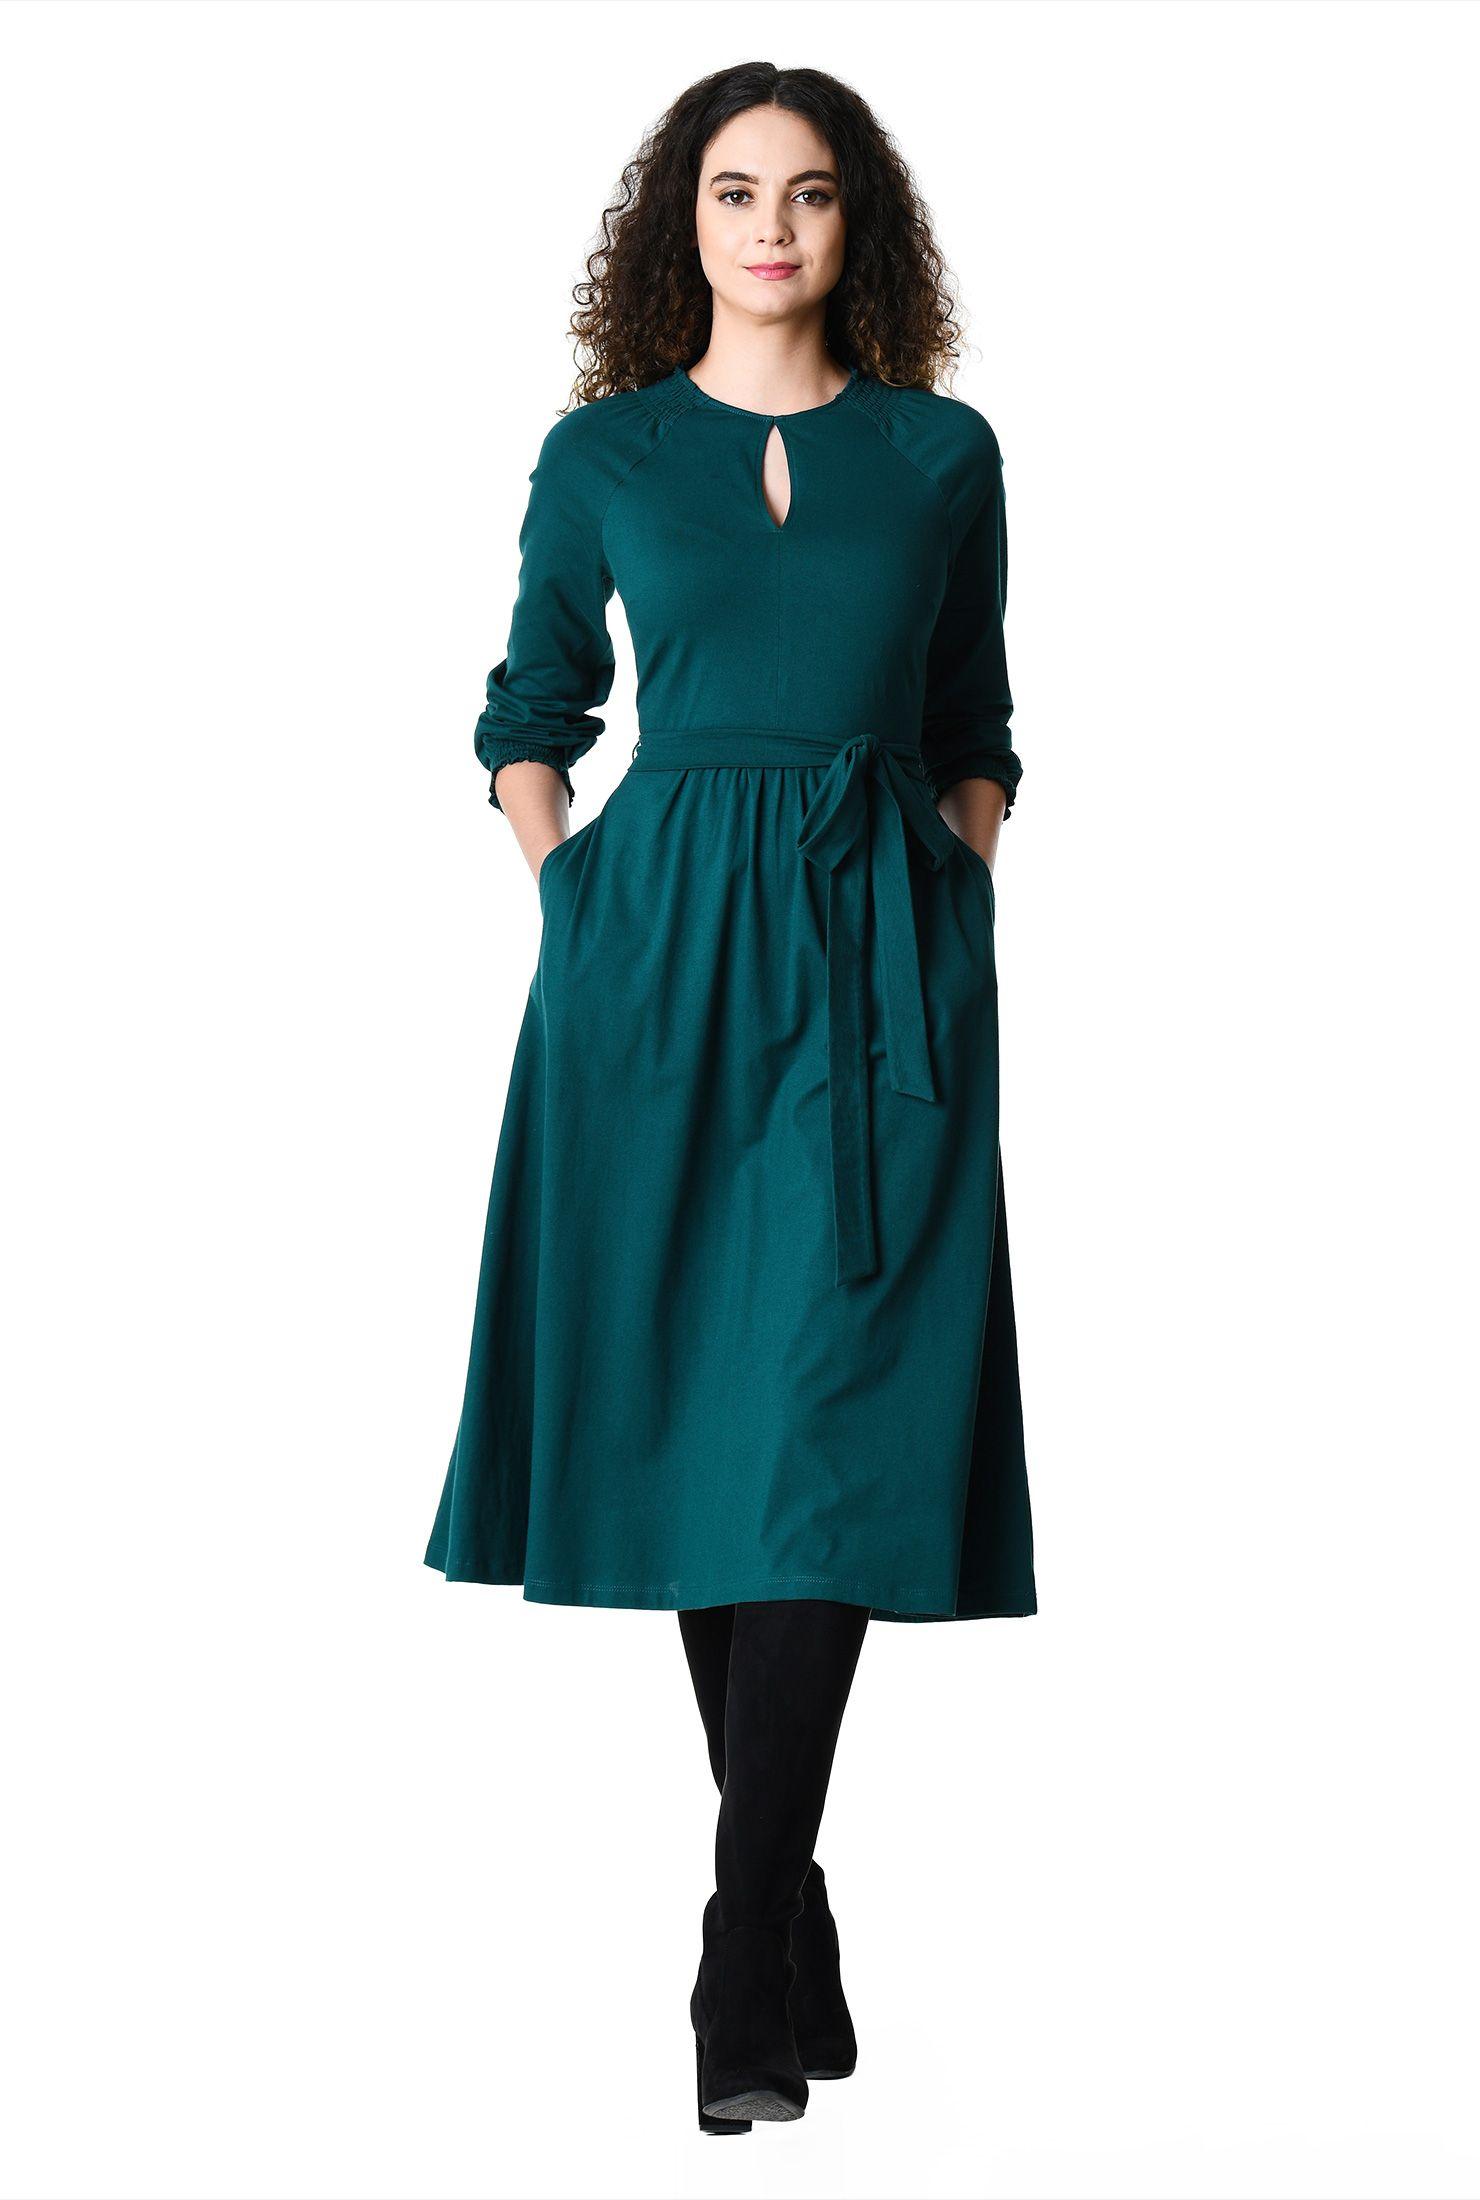 897e3ec25fe4 Ladies Occasion Wear Dresses - raveitsafe